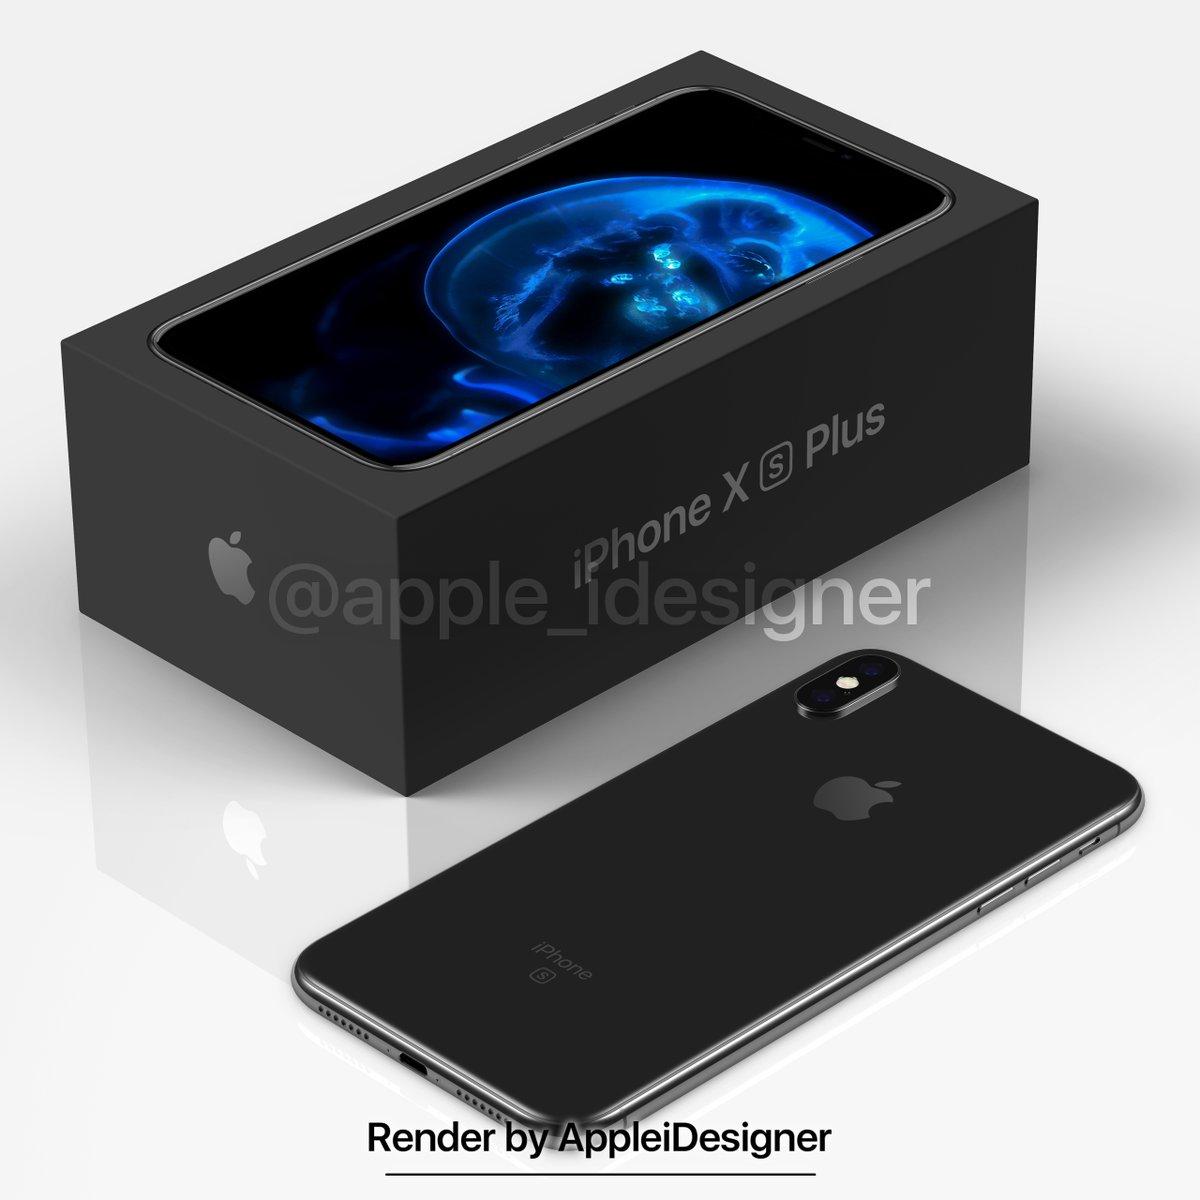 Iphone X Plus Render By Appleidesigner 2